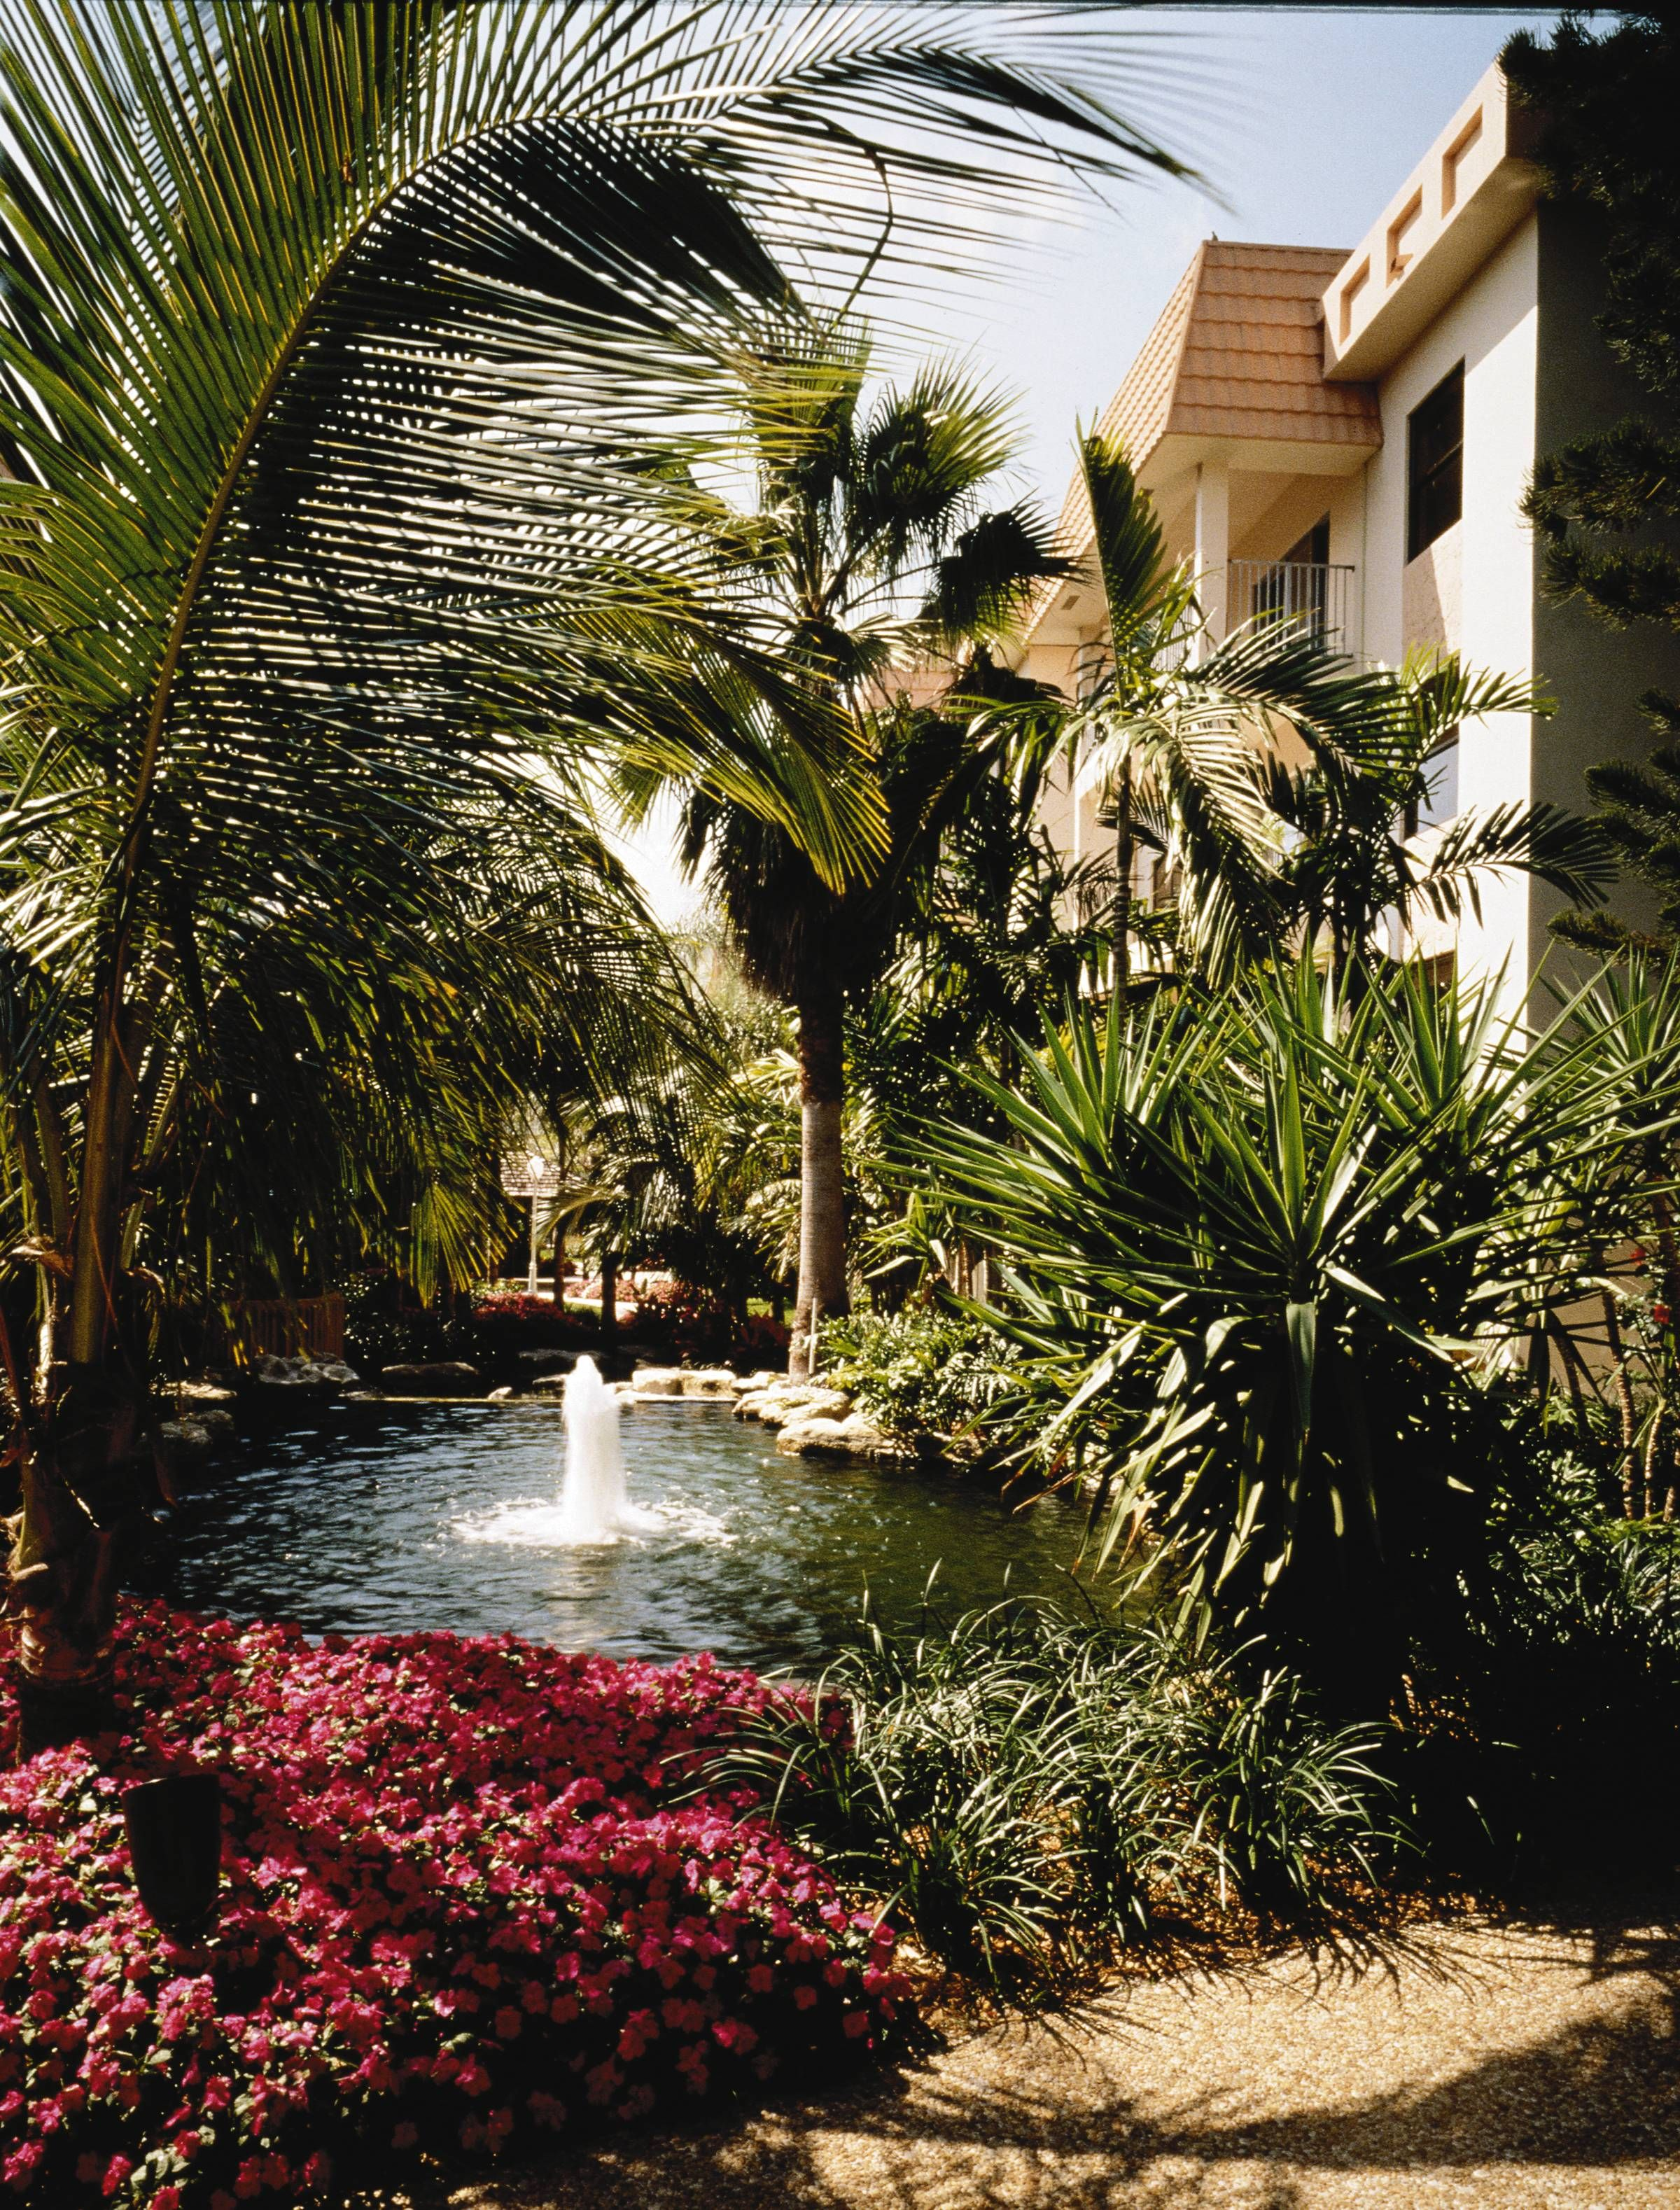 Wyndham Sea Gardens in Pompano Beach, FL | Spring Break Dreaming ...